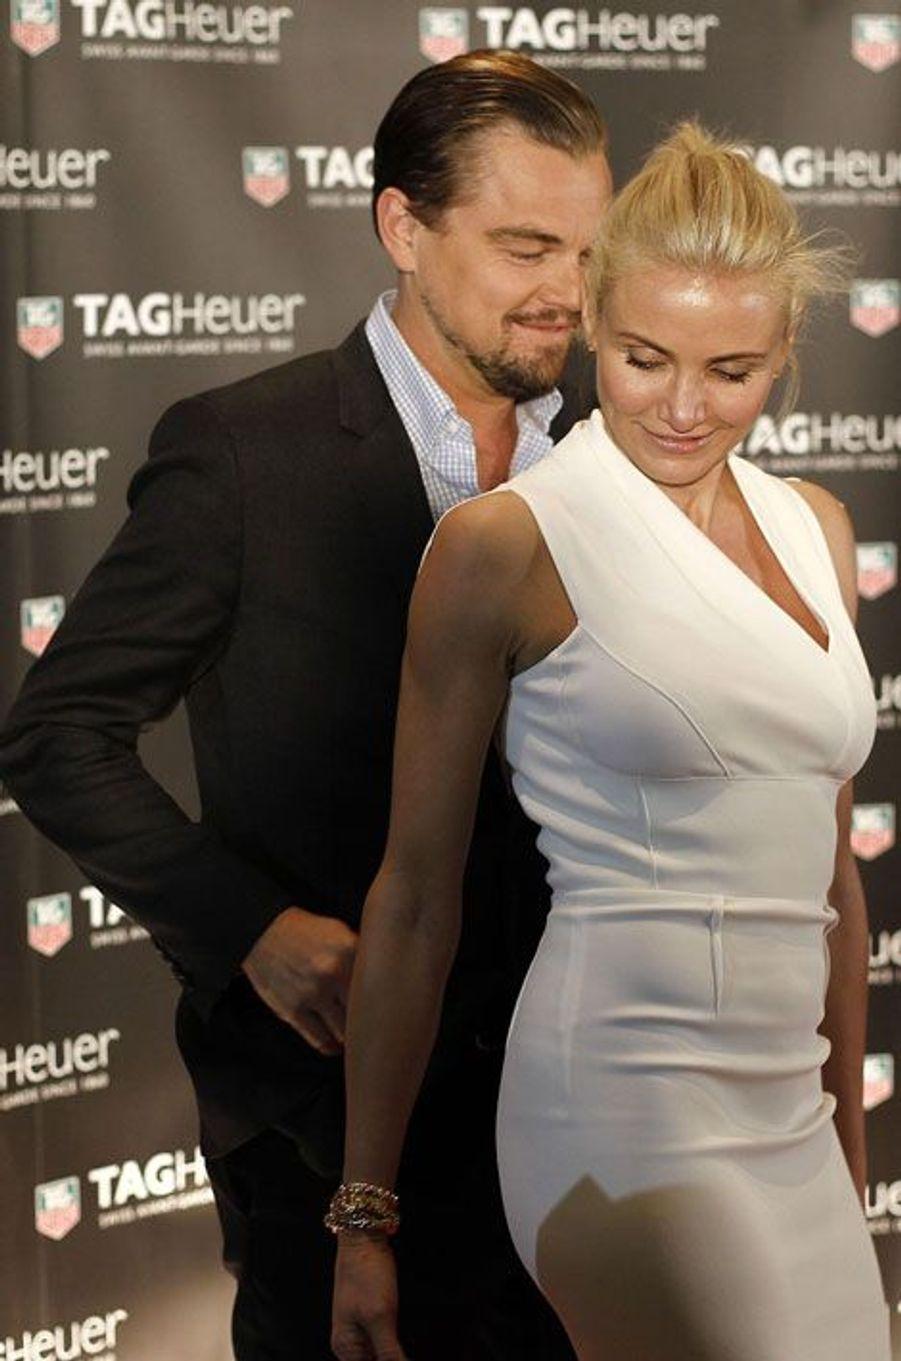 On la dit très proche de Leonardo DiCaprio en 2013